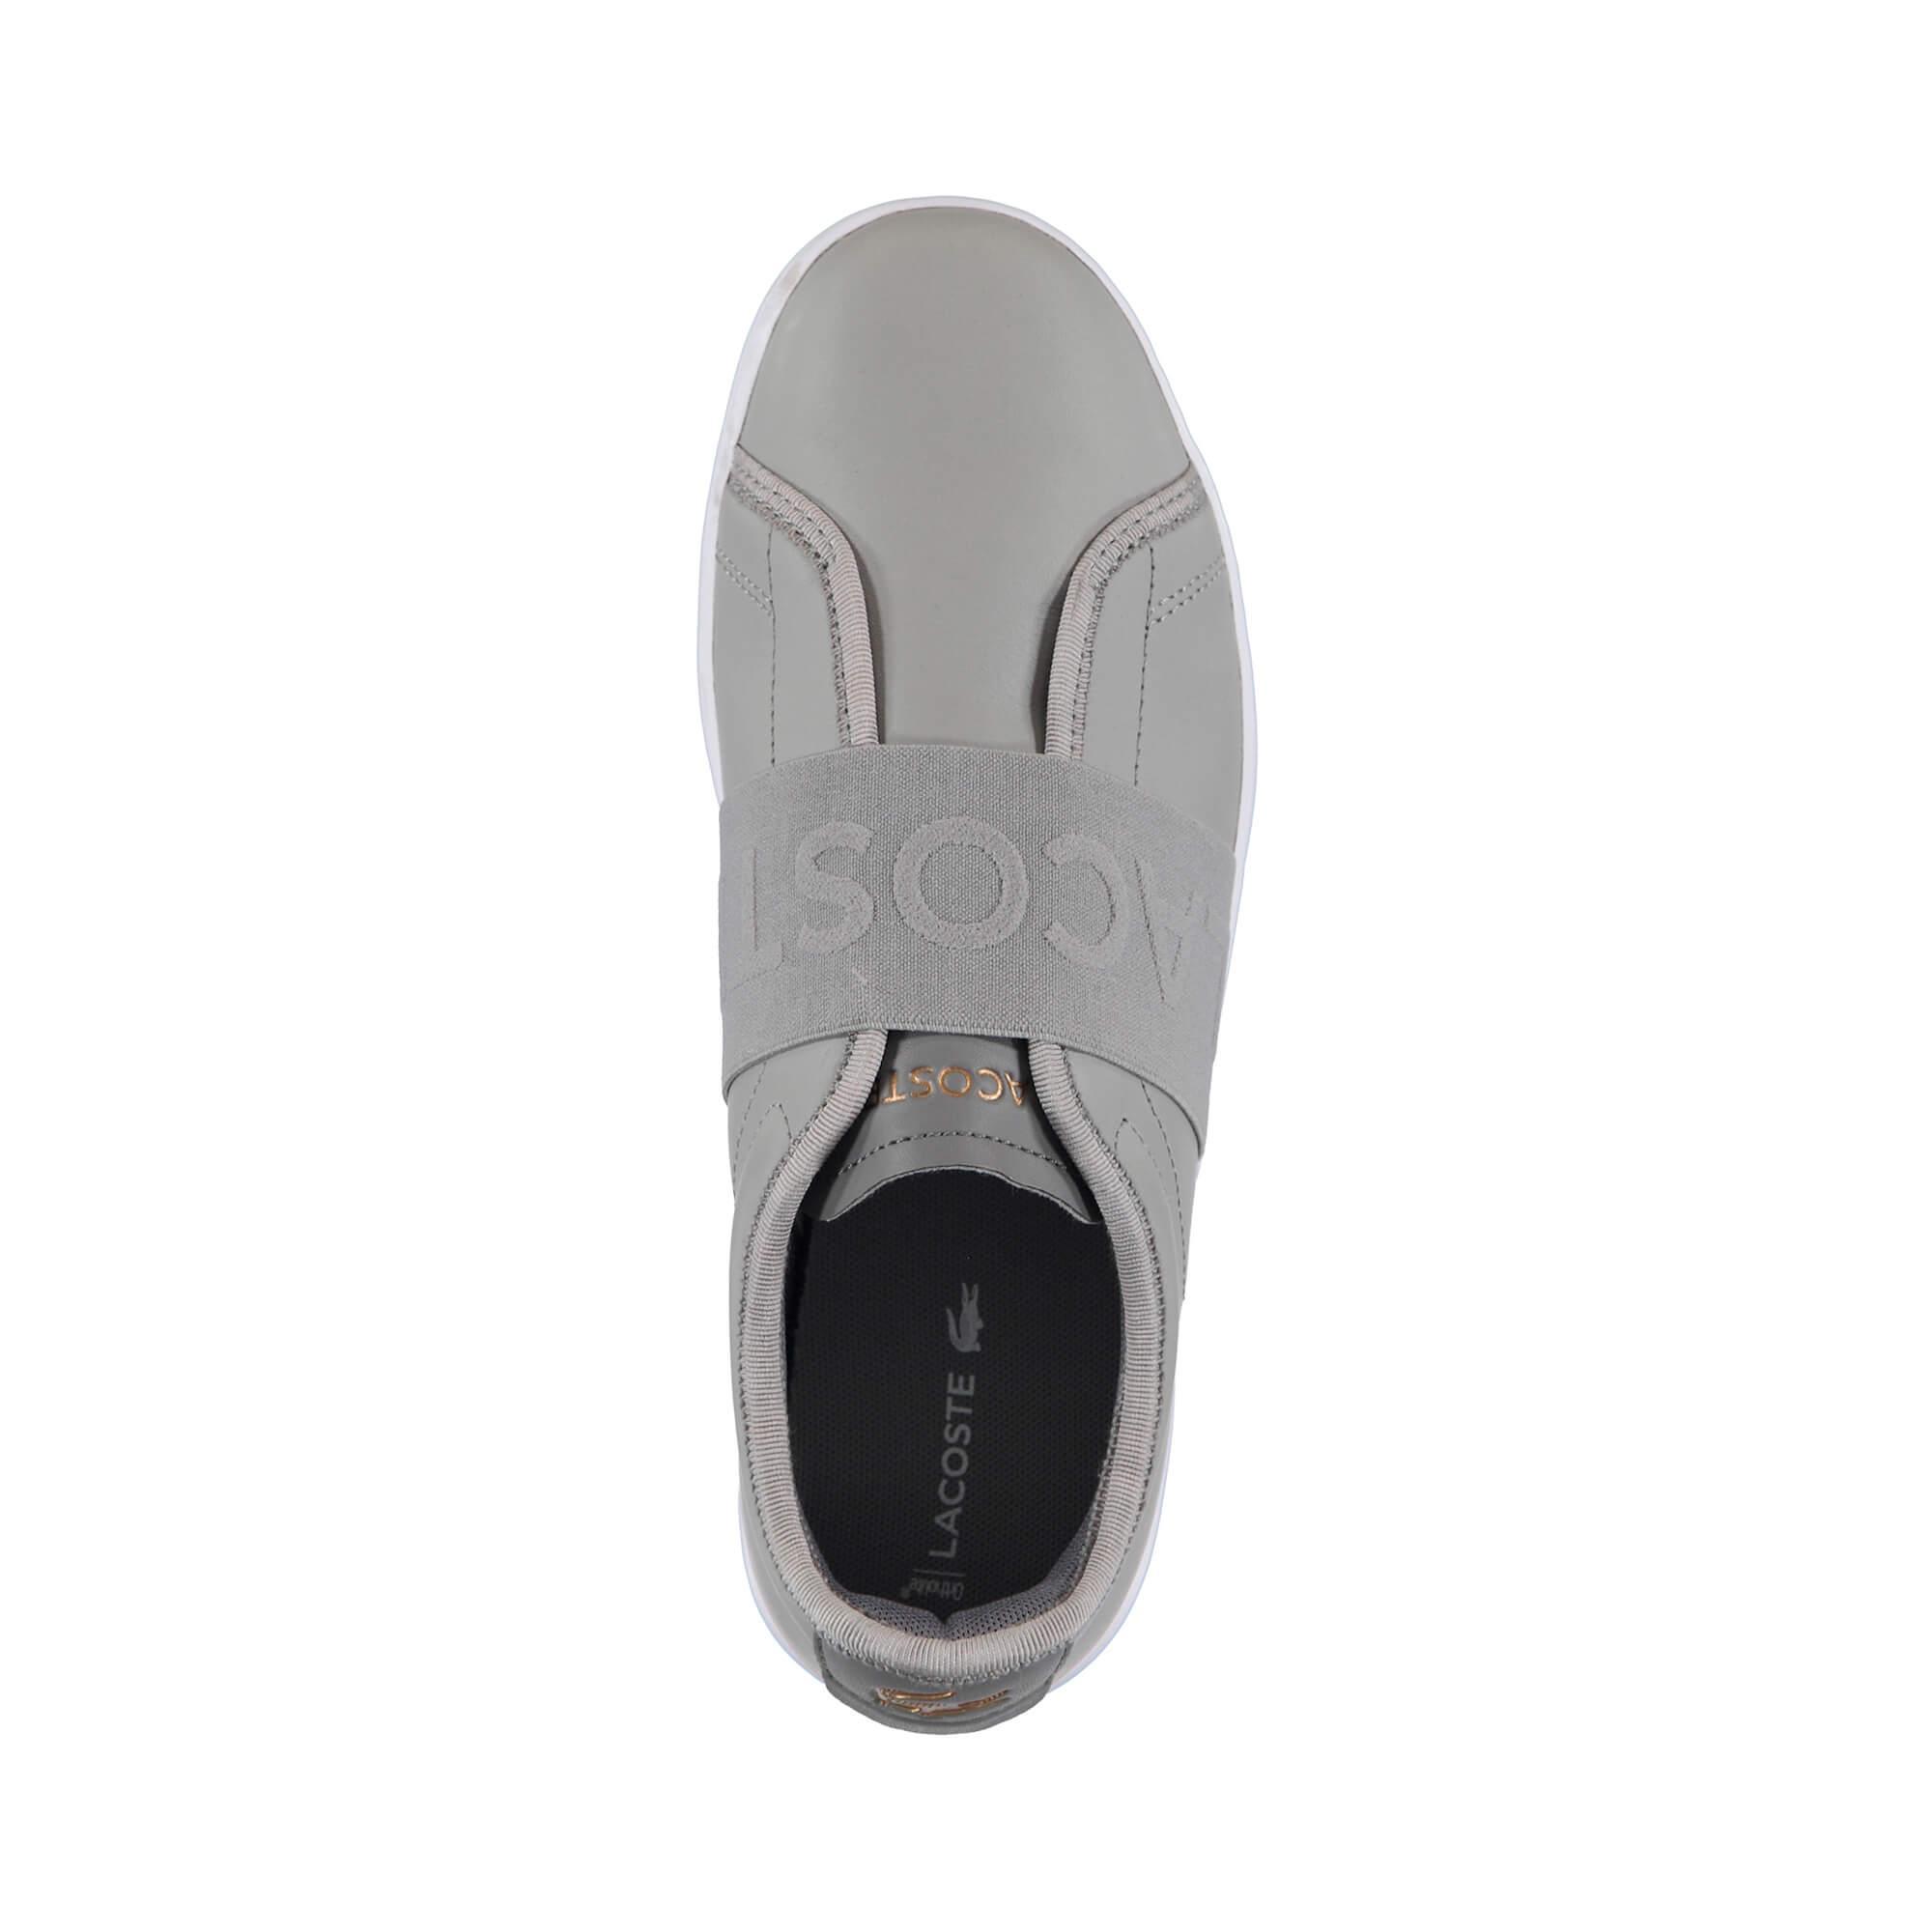 Lacoste Kadın Carnaby Evo Slip 318 1 Gri Sneaker